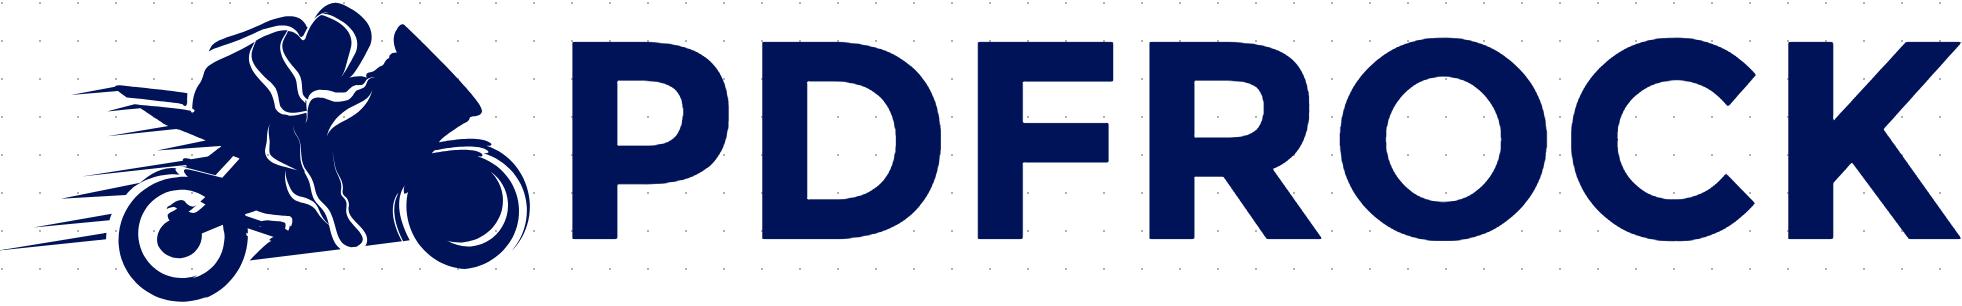 PDF Metadata Editor Online Free - PDFROCK COM